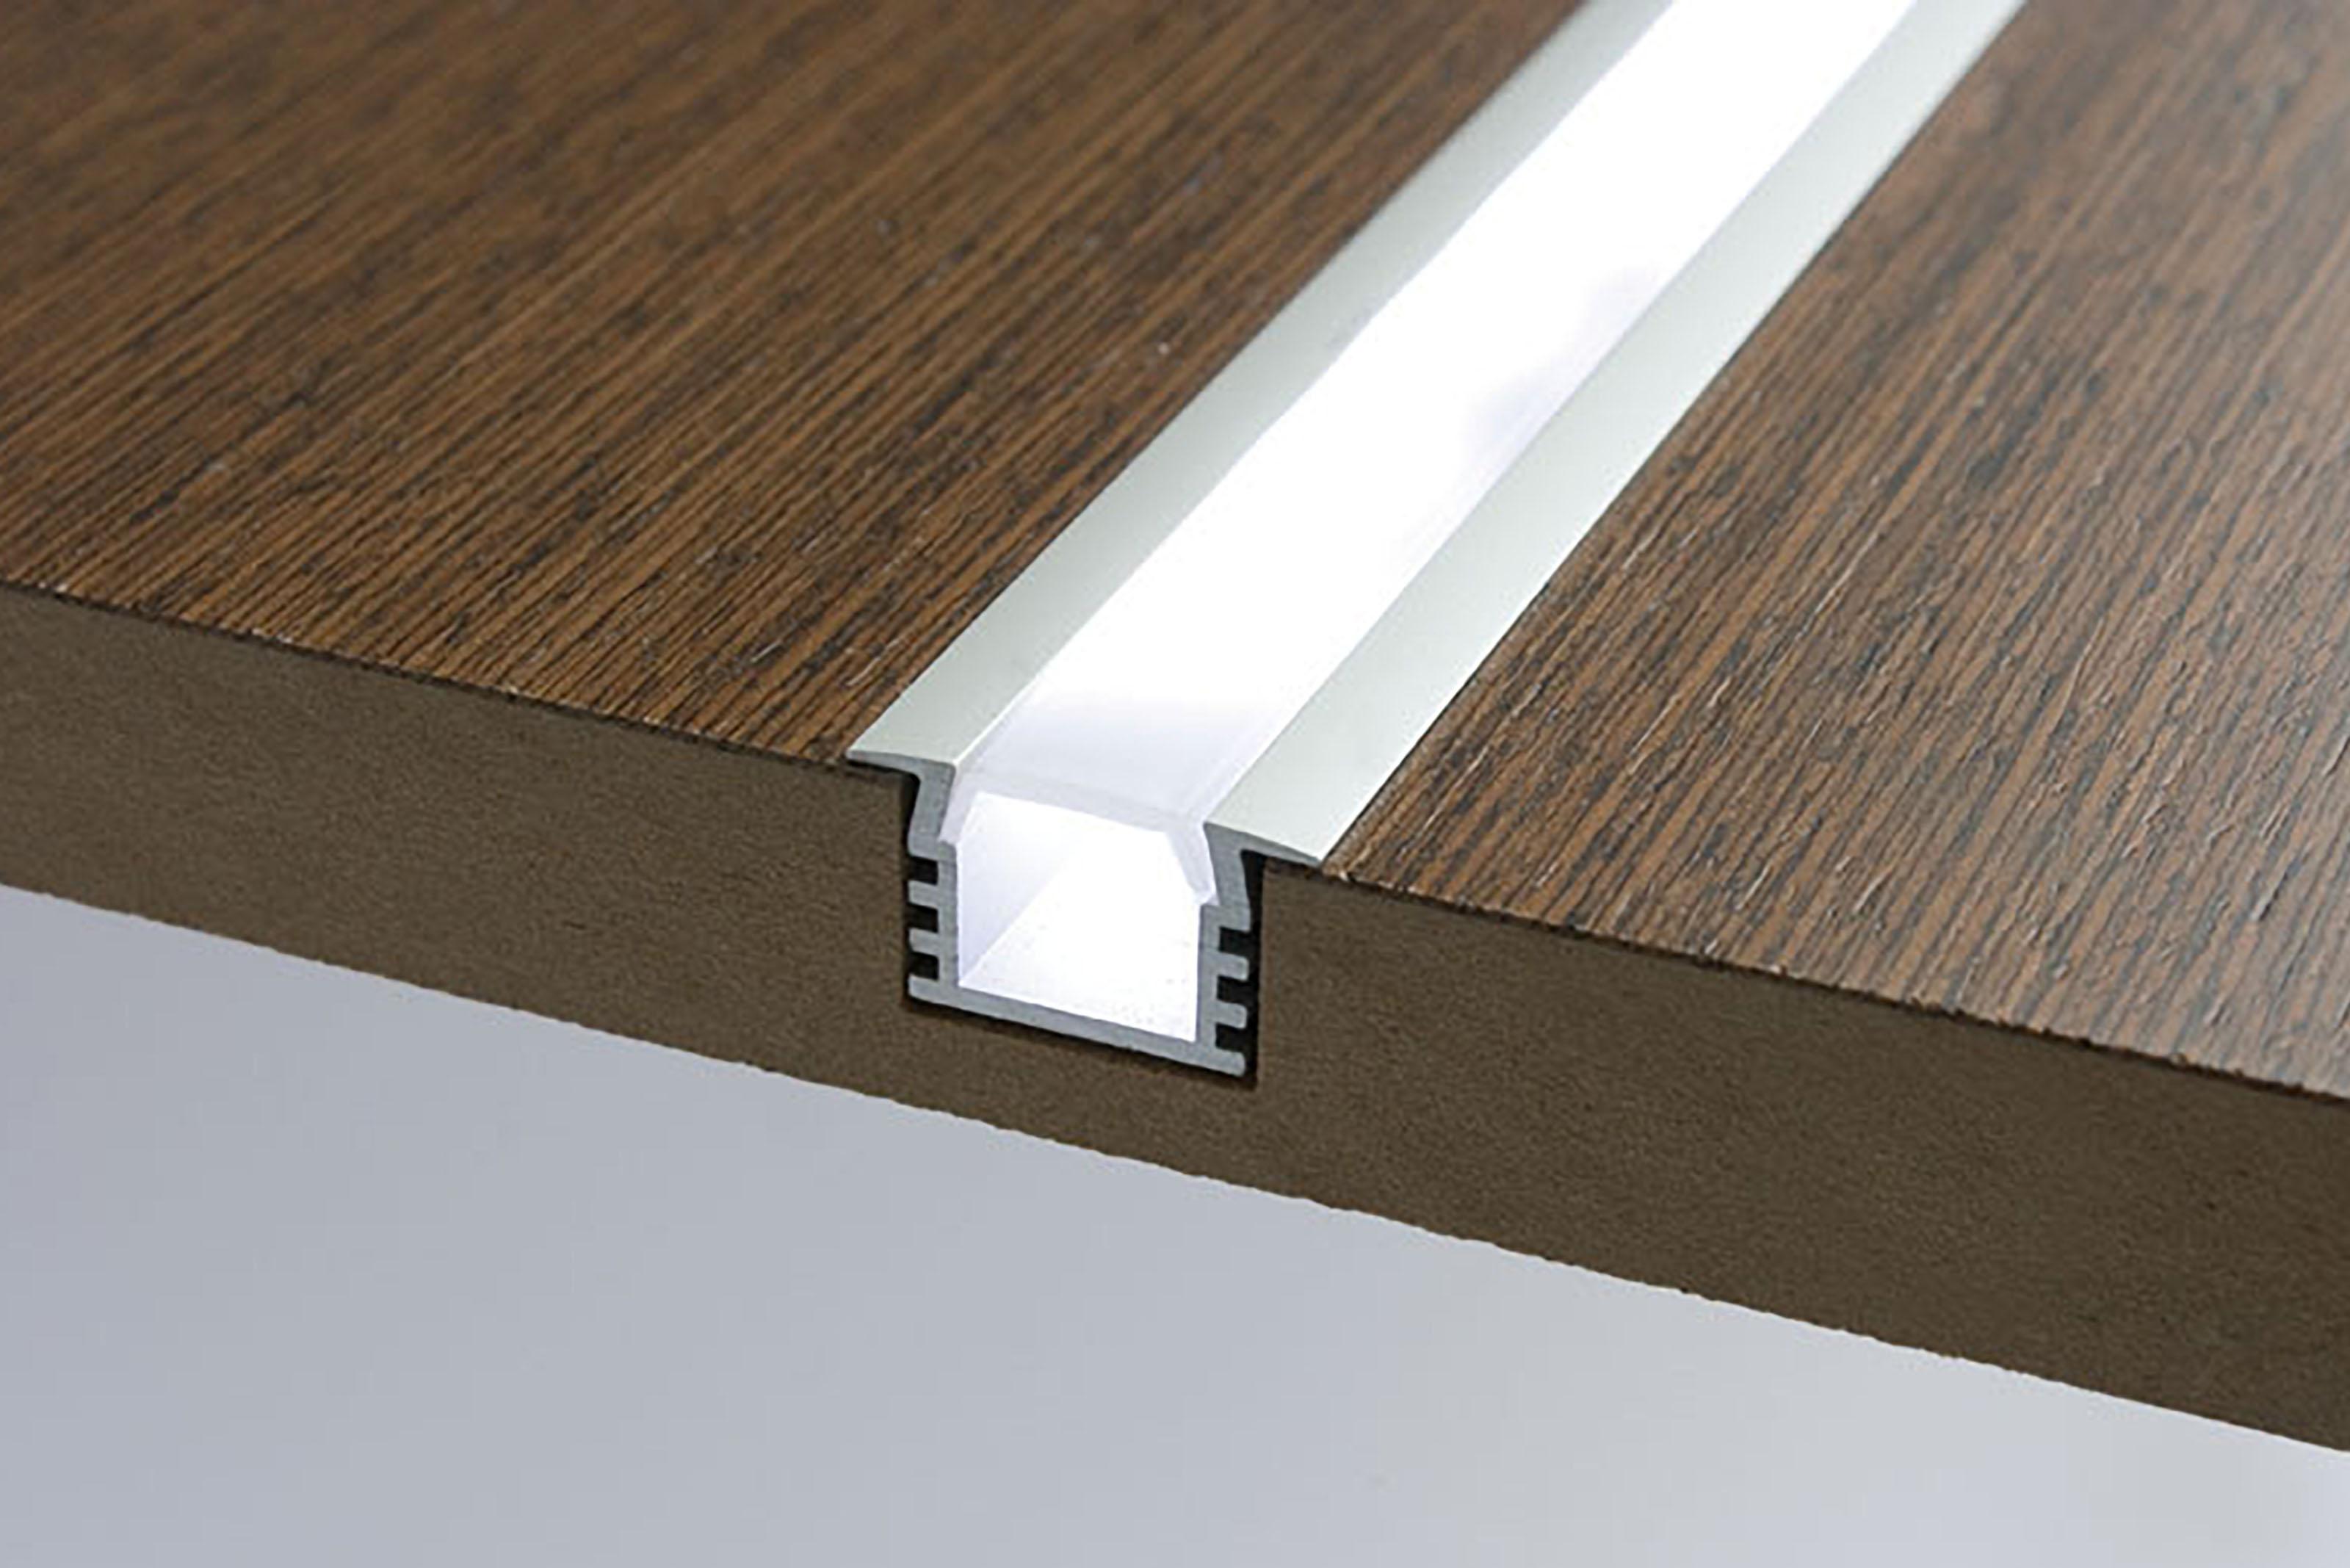 lightline-mini-square-f-2-mj-lighting-v2